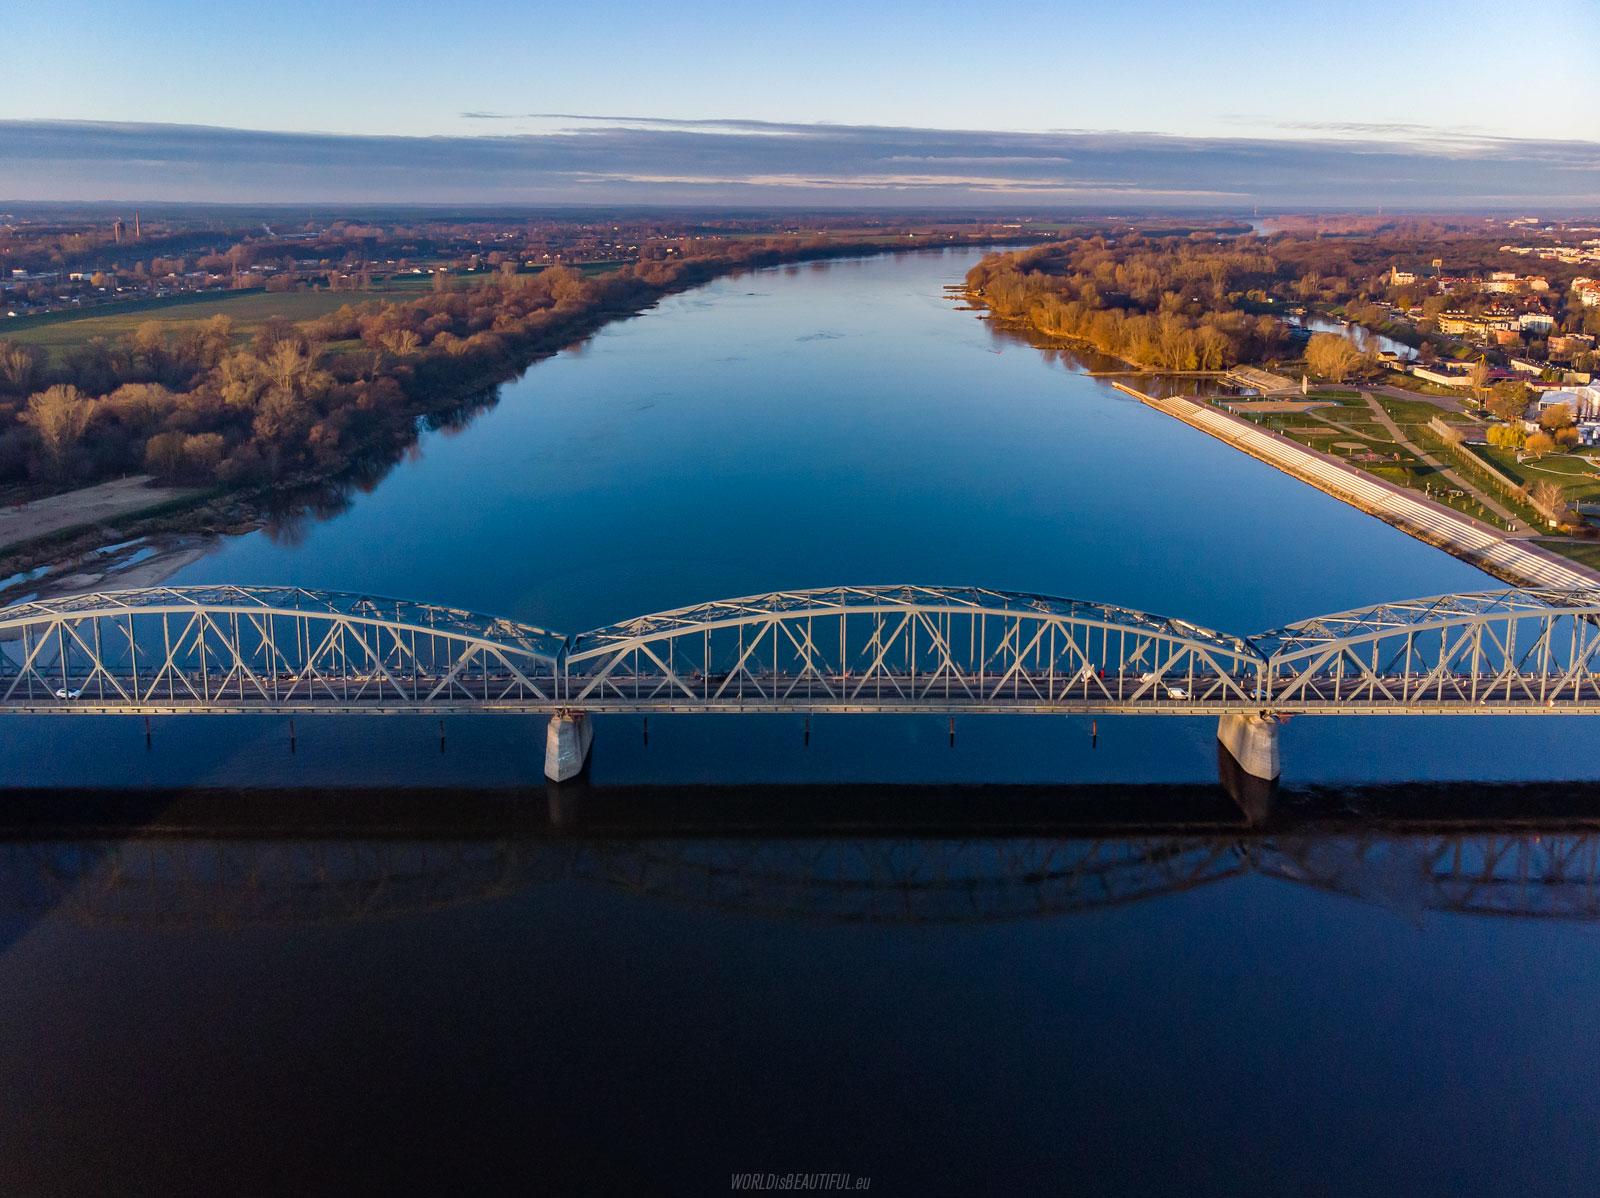 Bridge over the Vistula River in Toruń